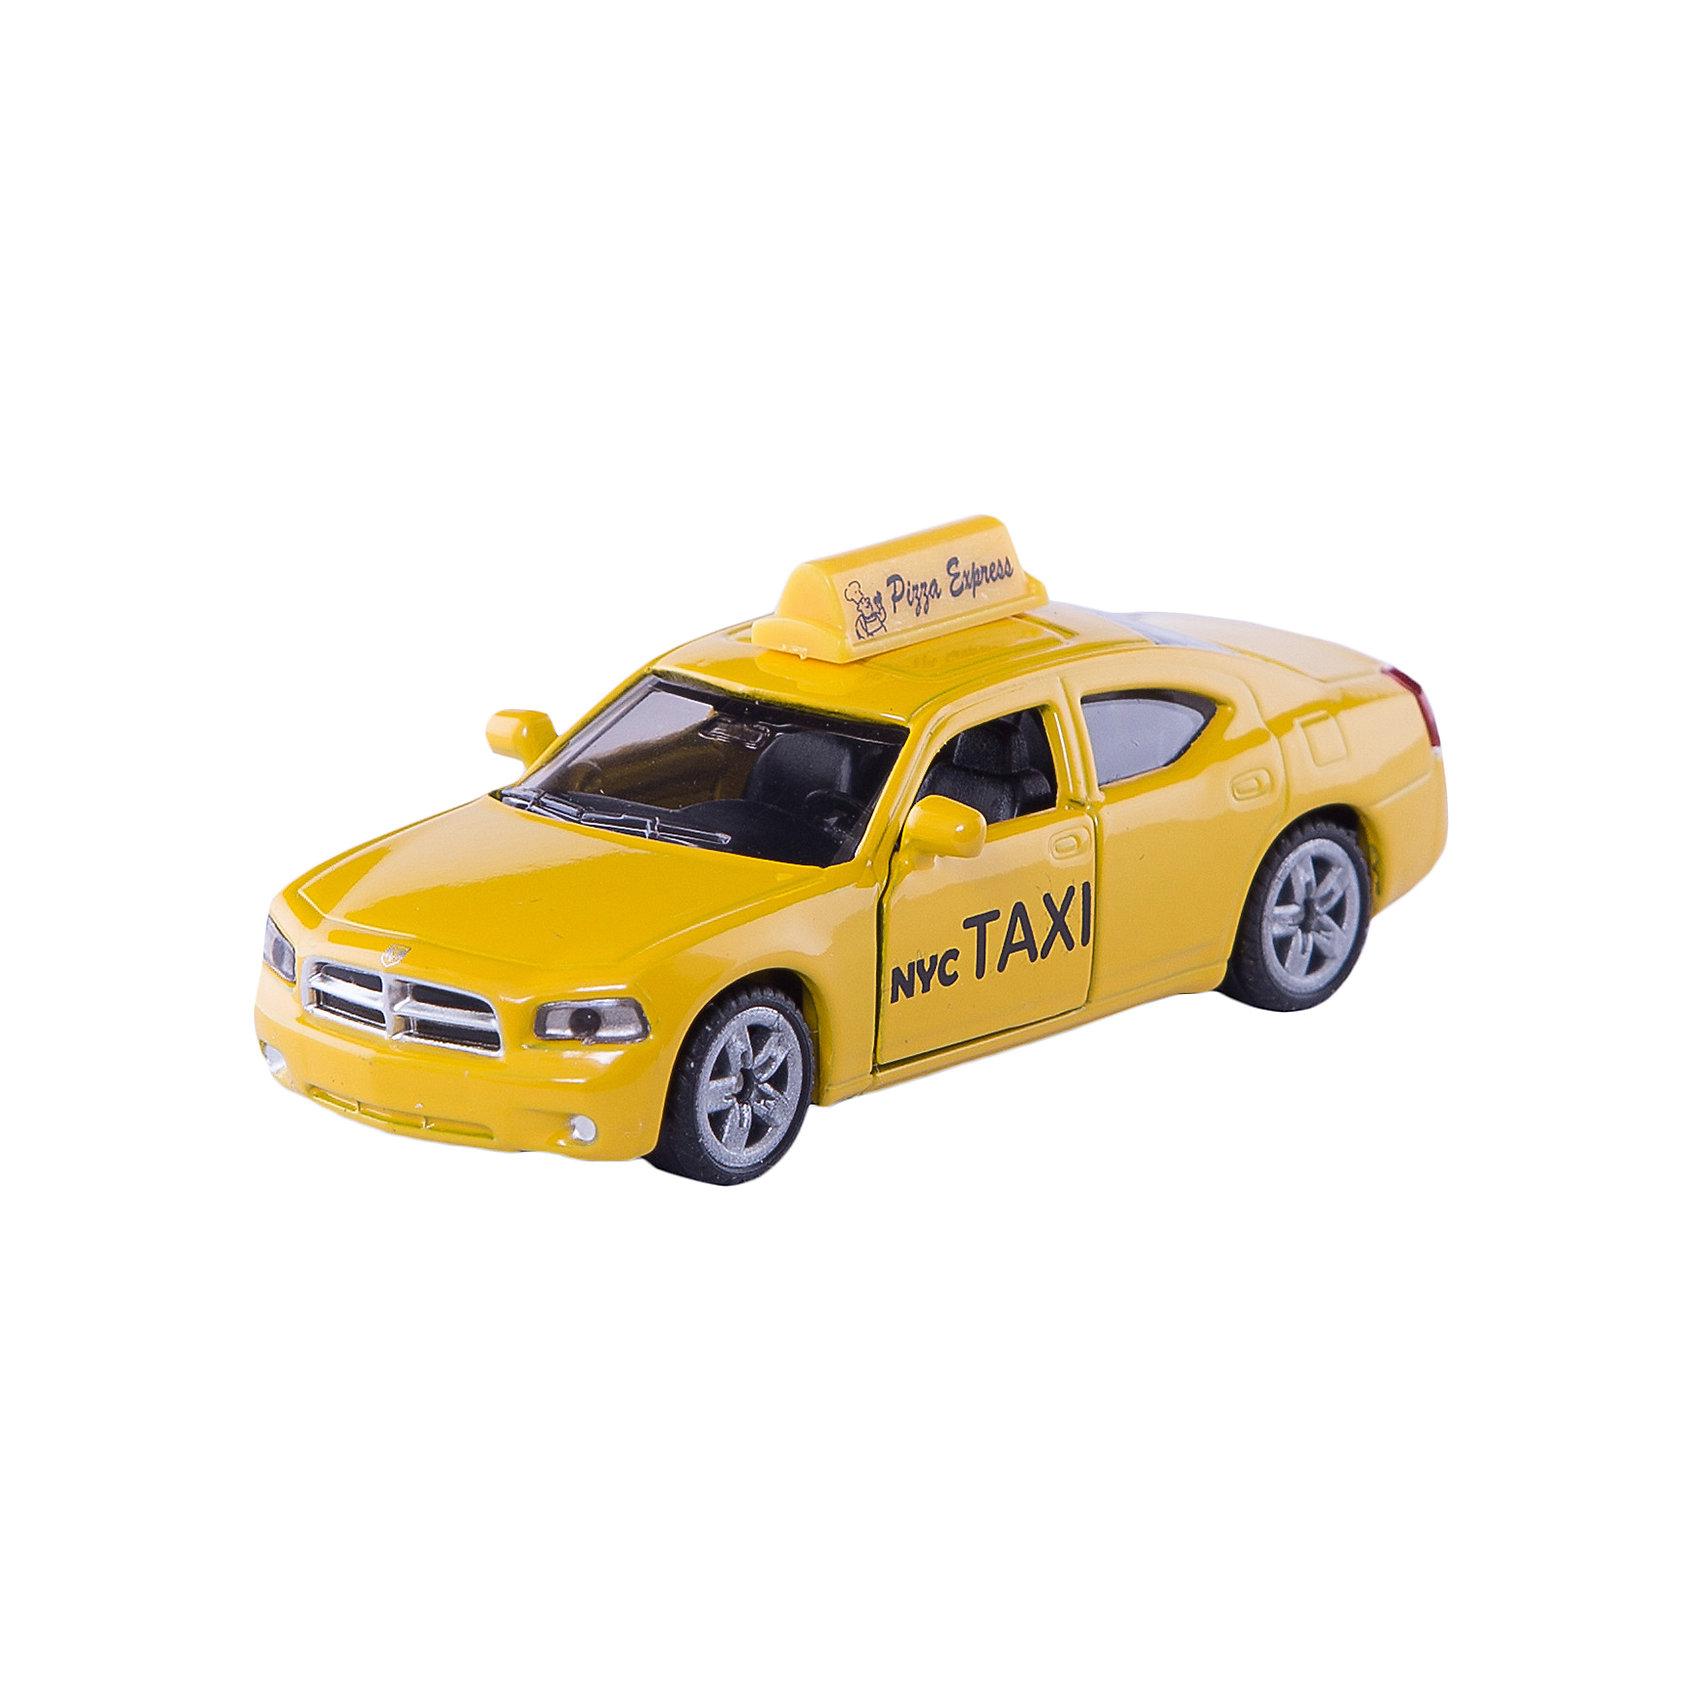 SIKU SIKU 1490 Американское такси siku siku 1007 bmw 645i cabrio